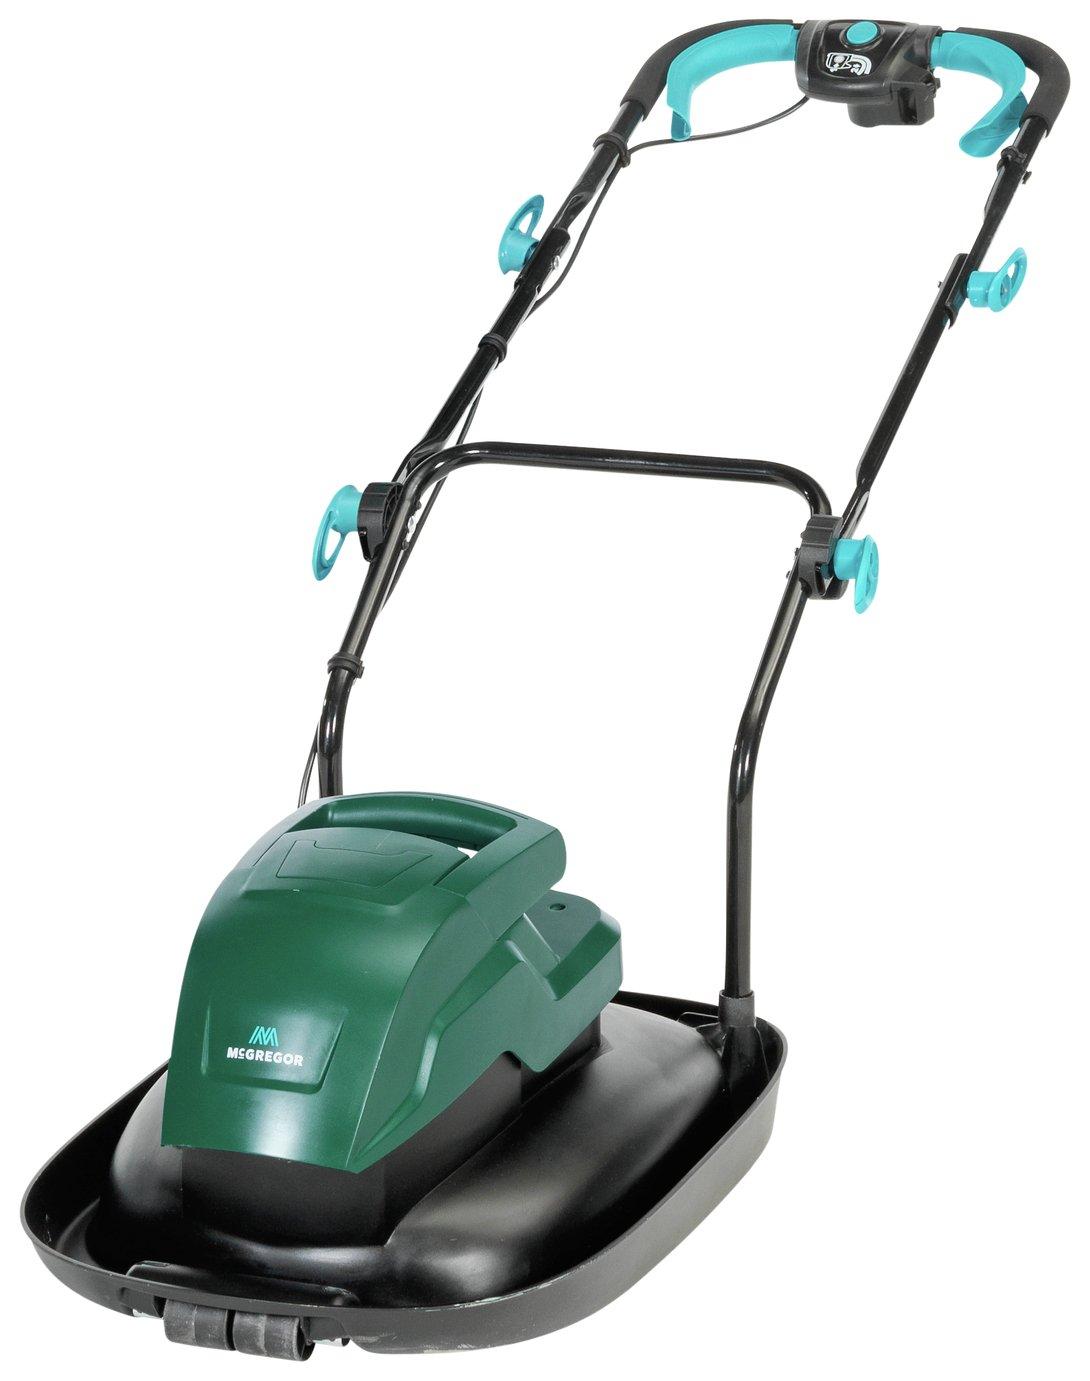 McGregor 33cm Hover Lawnmower - 1500W